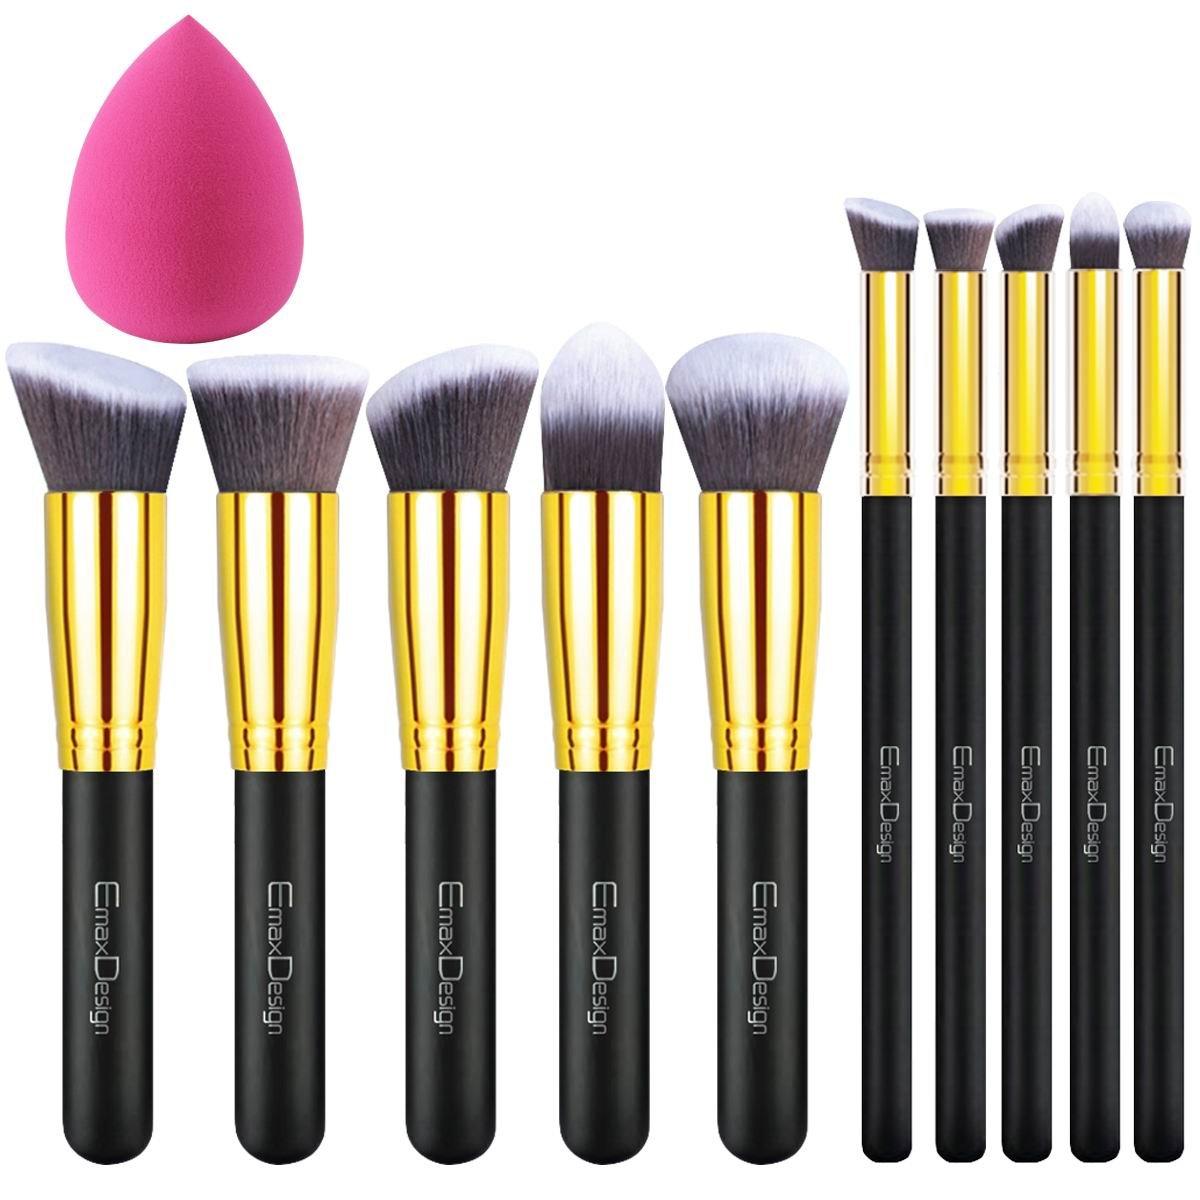 EmaxDesign 10+1 Pieces Makeup Brush Set, 10 Pieces Professional Foundation Blending Blush Eye Face Liquid Powder Cream Cosmetics Brushes & 1 Piece Rose Red Beauty Sponge Blender